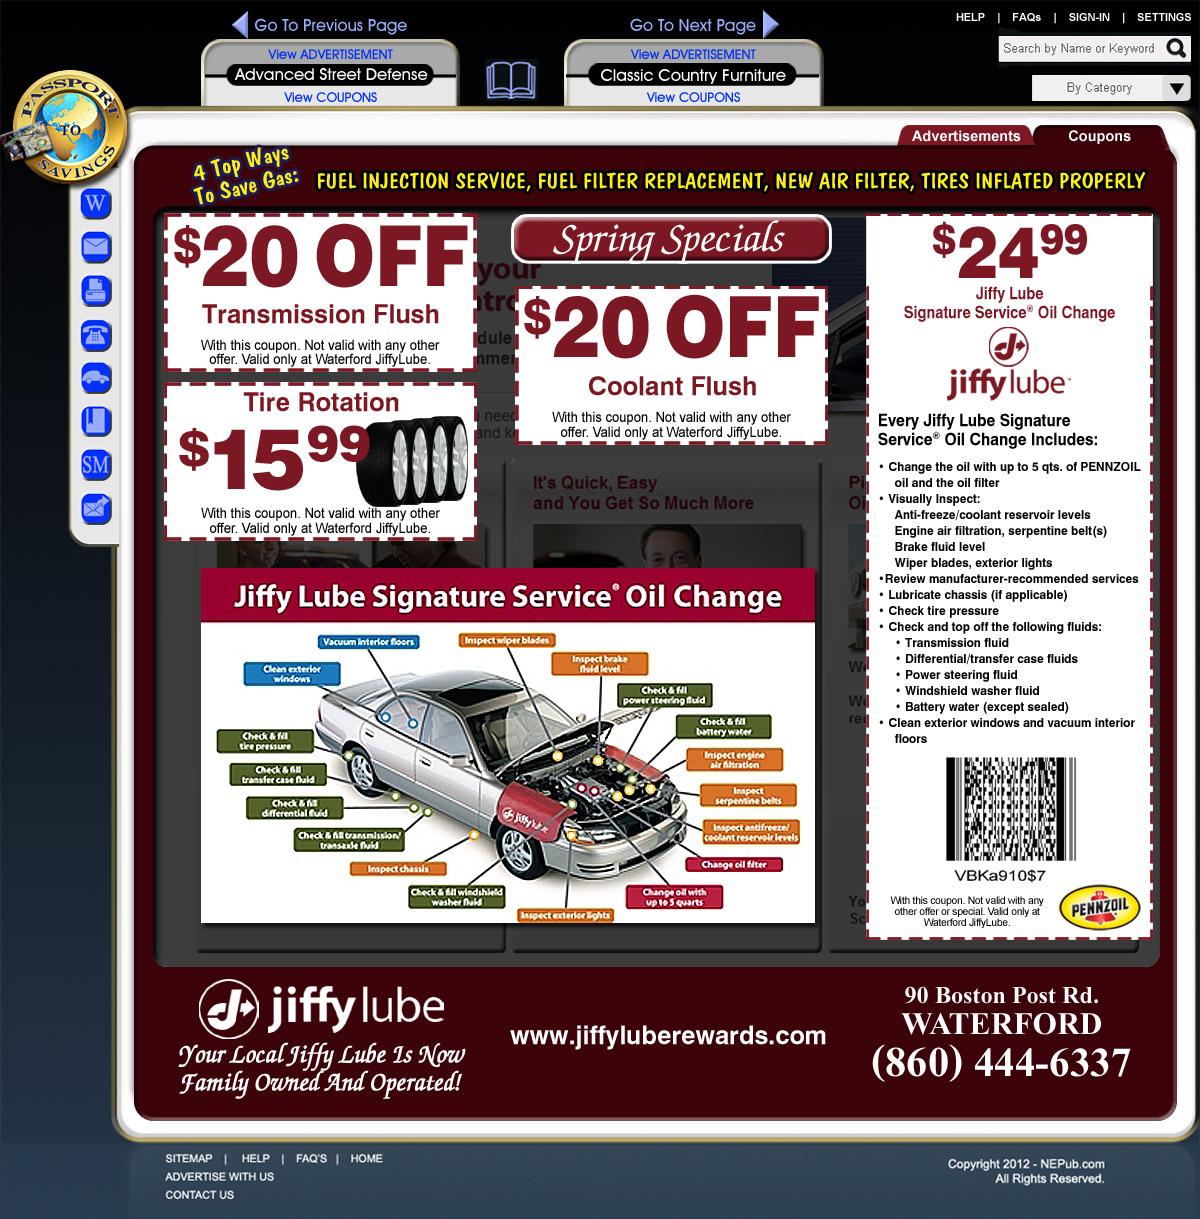 Transmission fluid change coupon jiffy lube